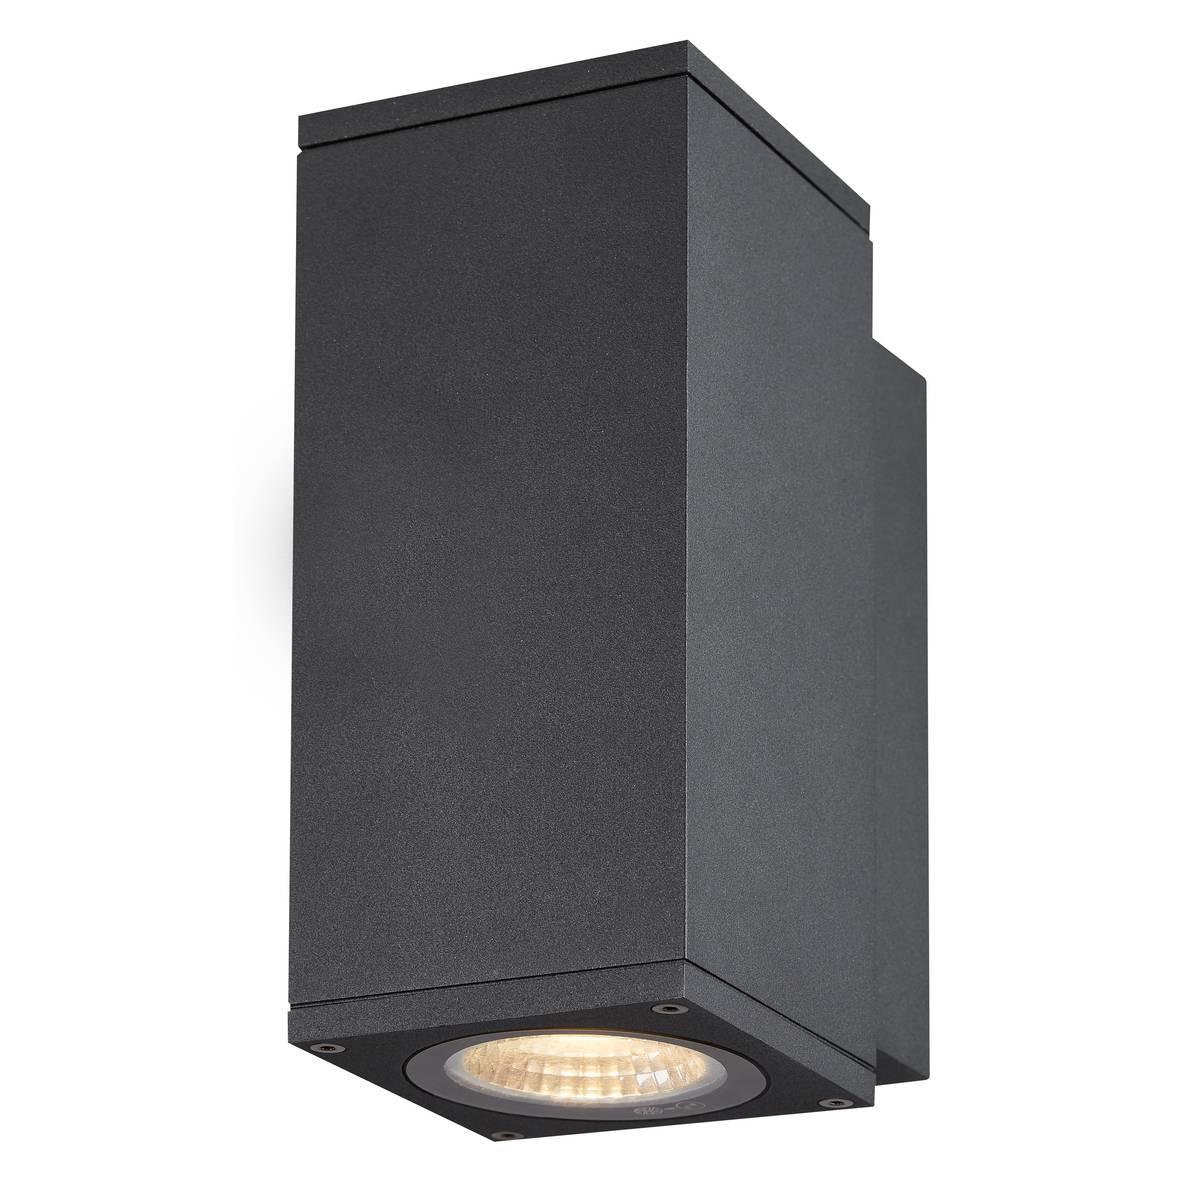 SLV buiten wandlamp Enola Square S - antraciet